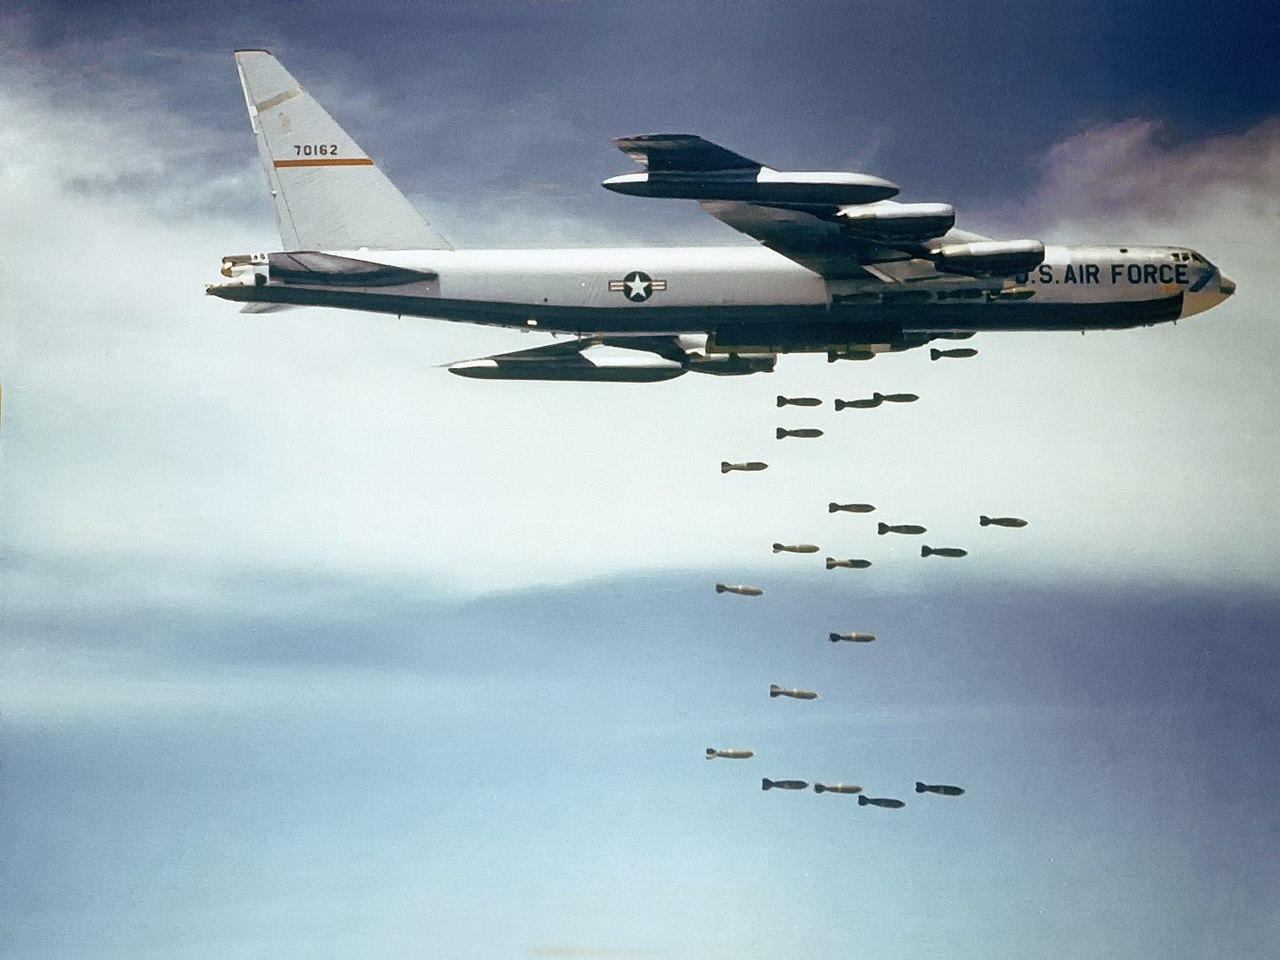 B52 dropping bombs